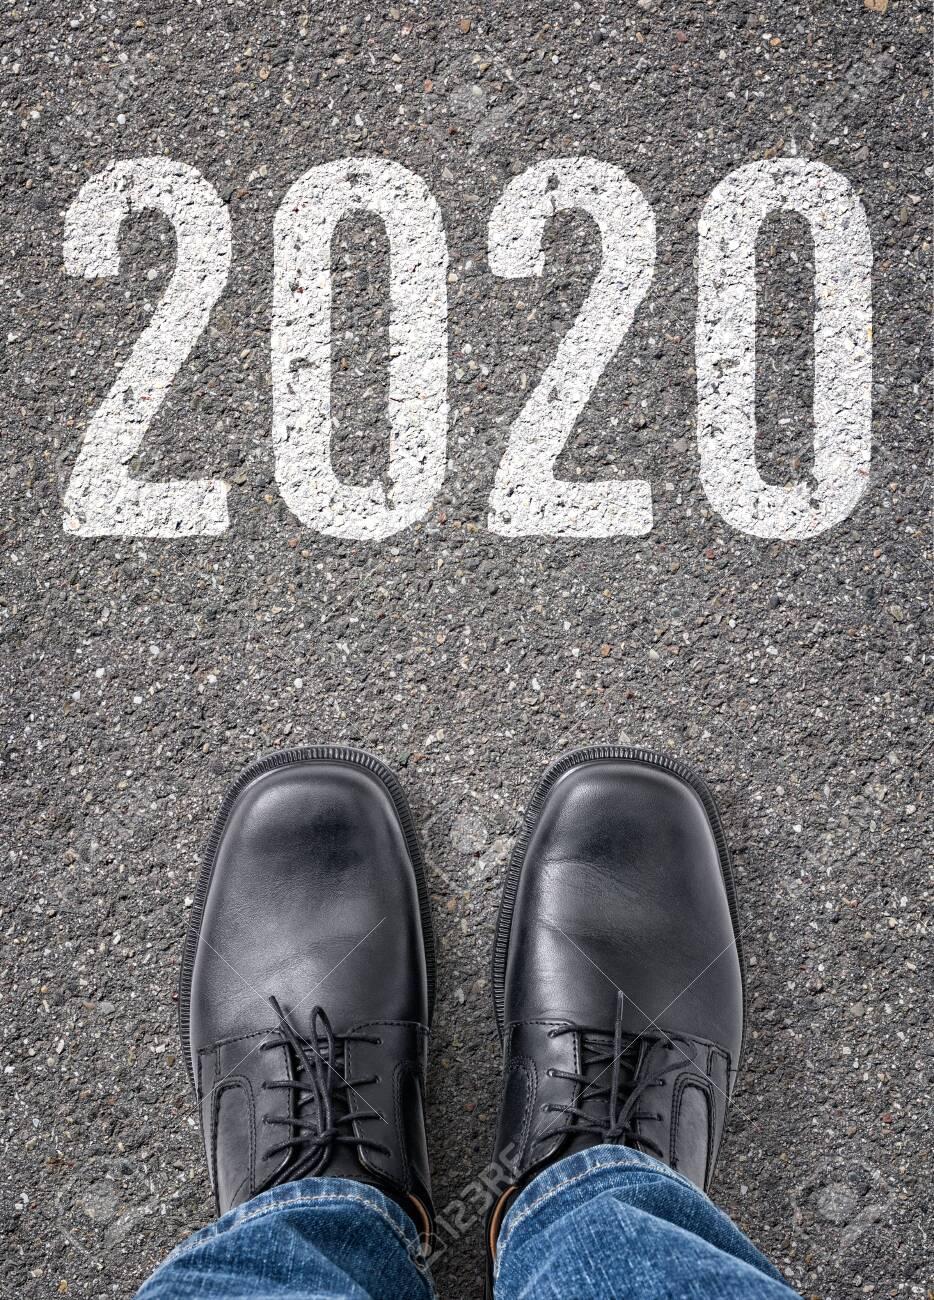 Text on the floor - 2020 - 134566674